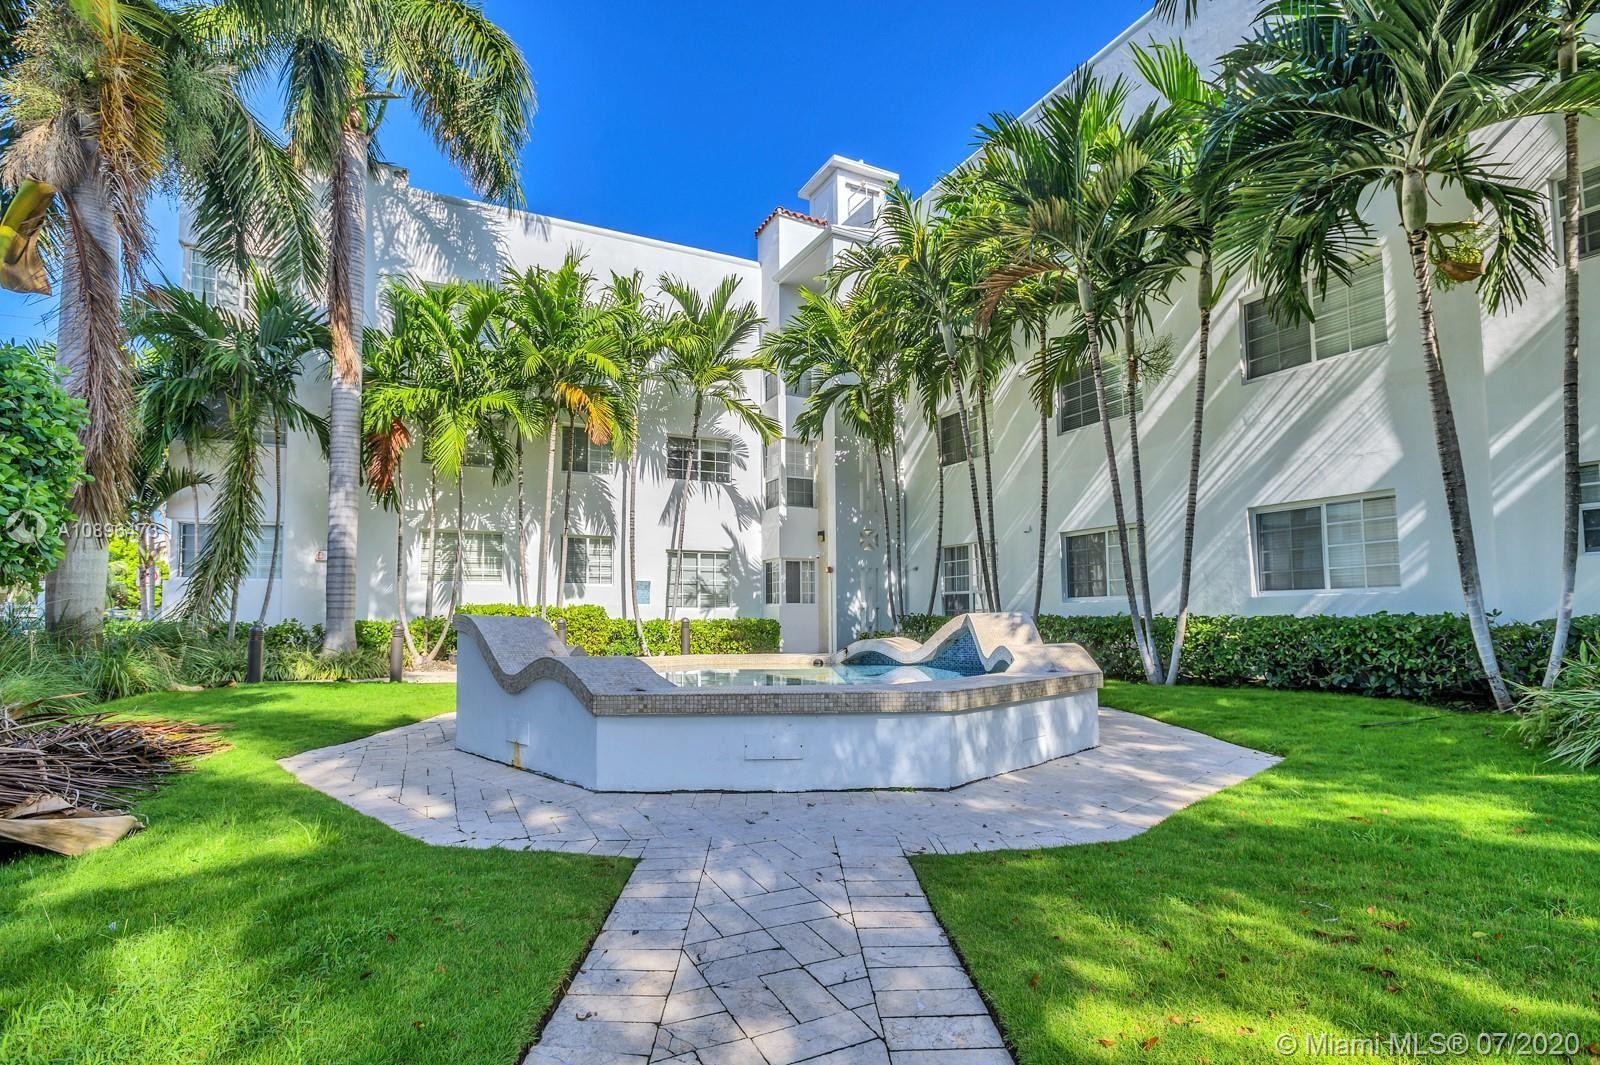 1300 Pennsylvania Ave #202, Miami Beach, FL 33139 - #: A10896473